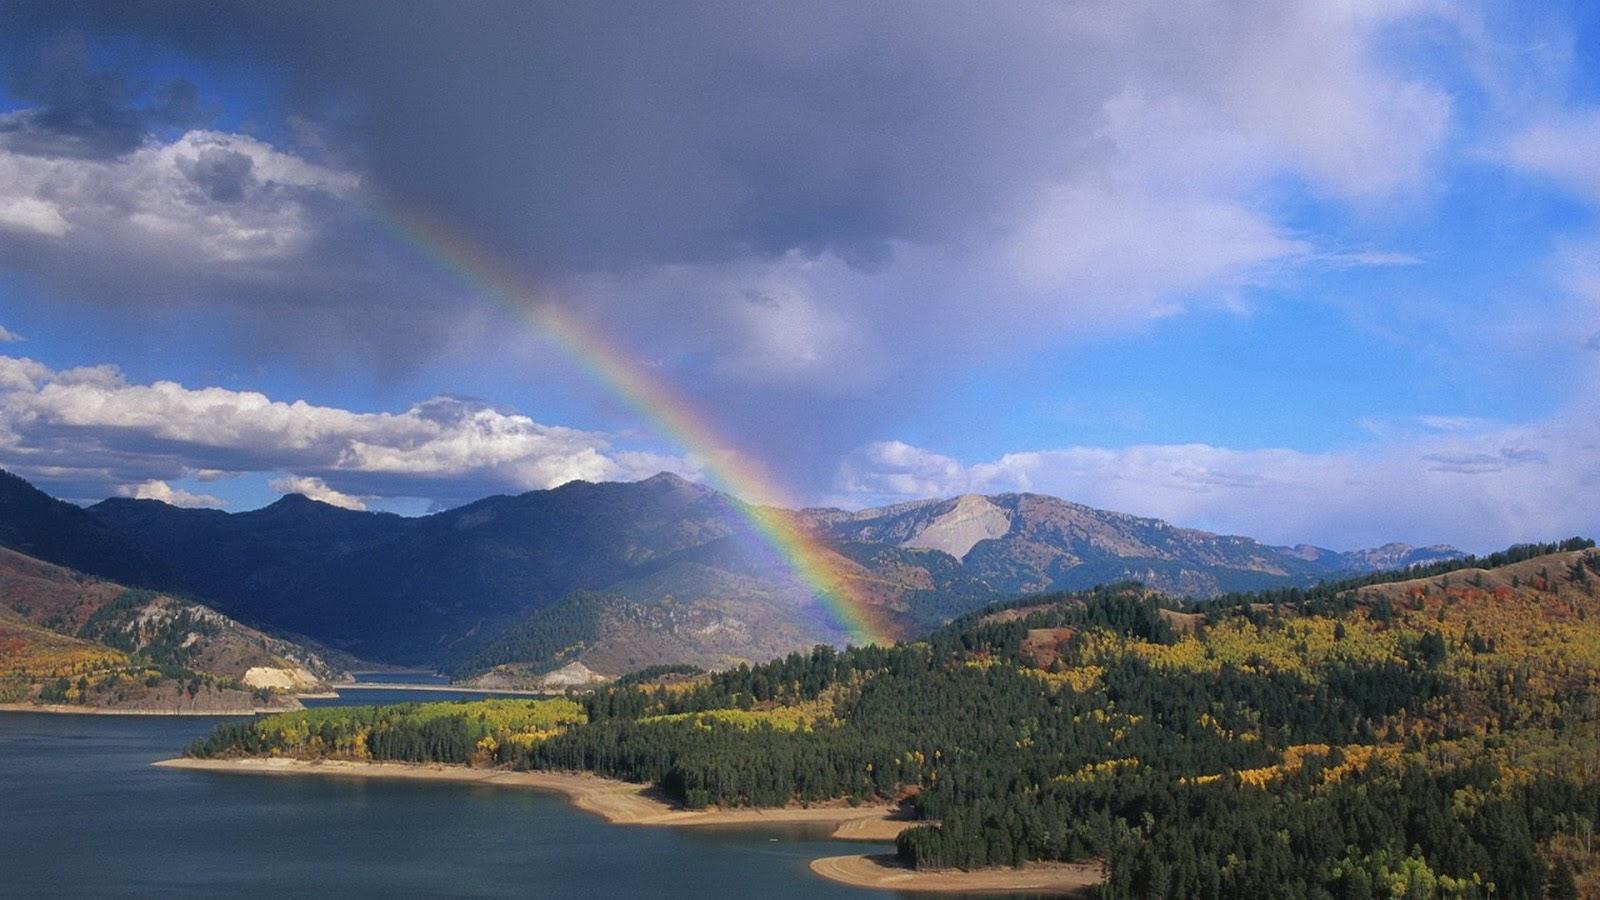 rainbow wallpapers hd - Free Wallpaper